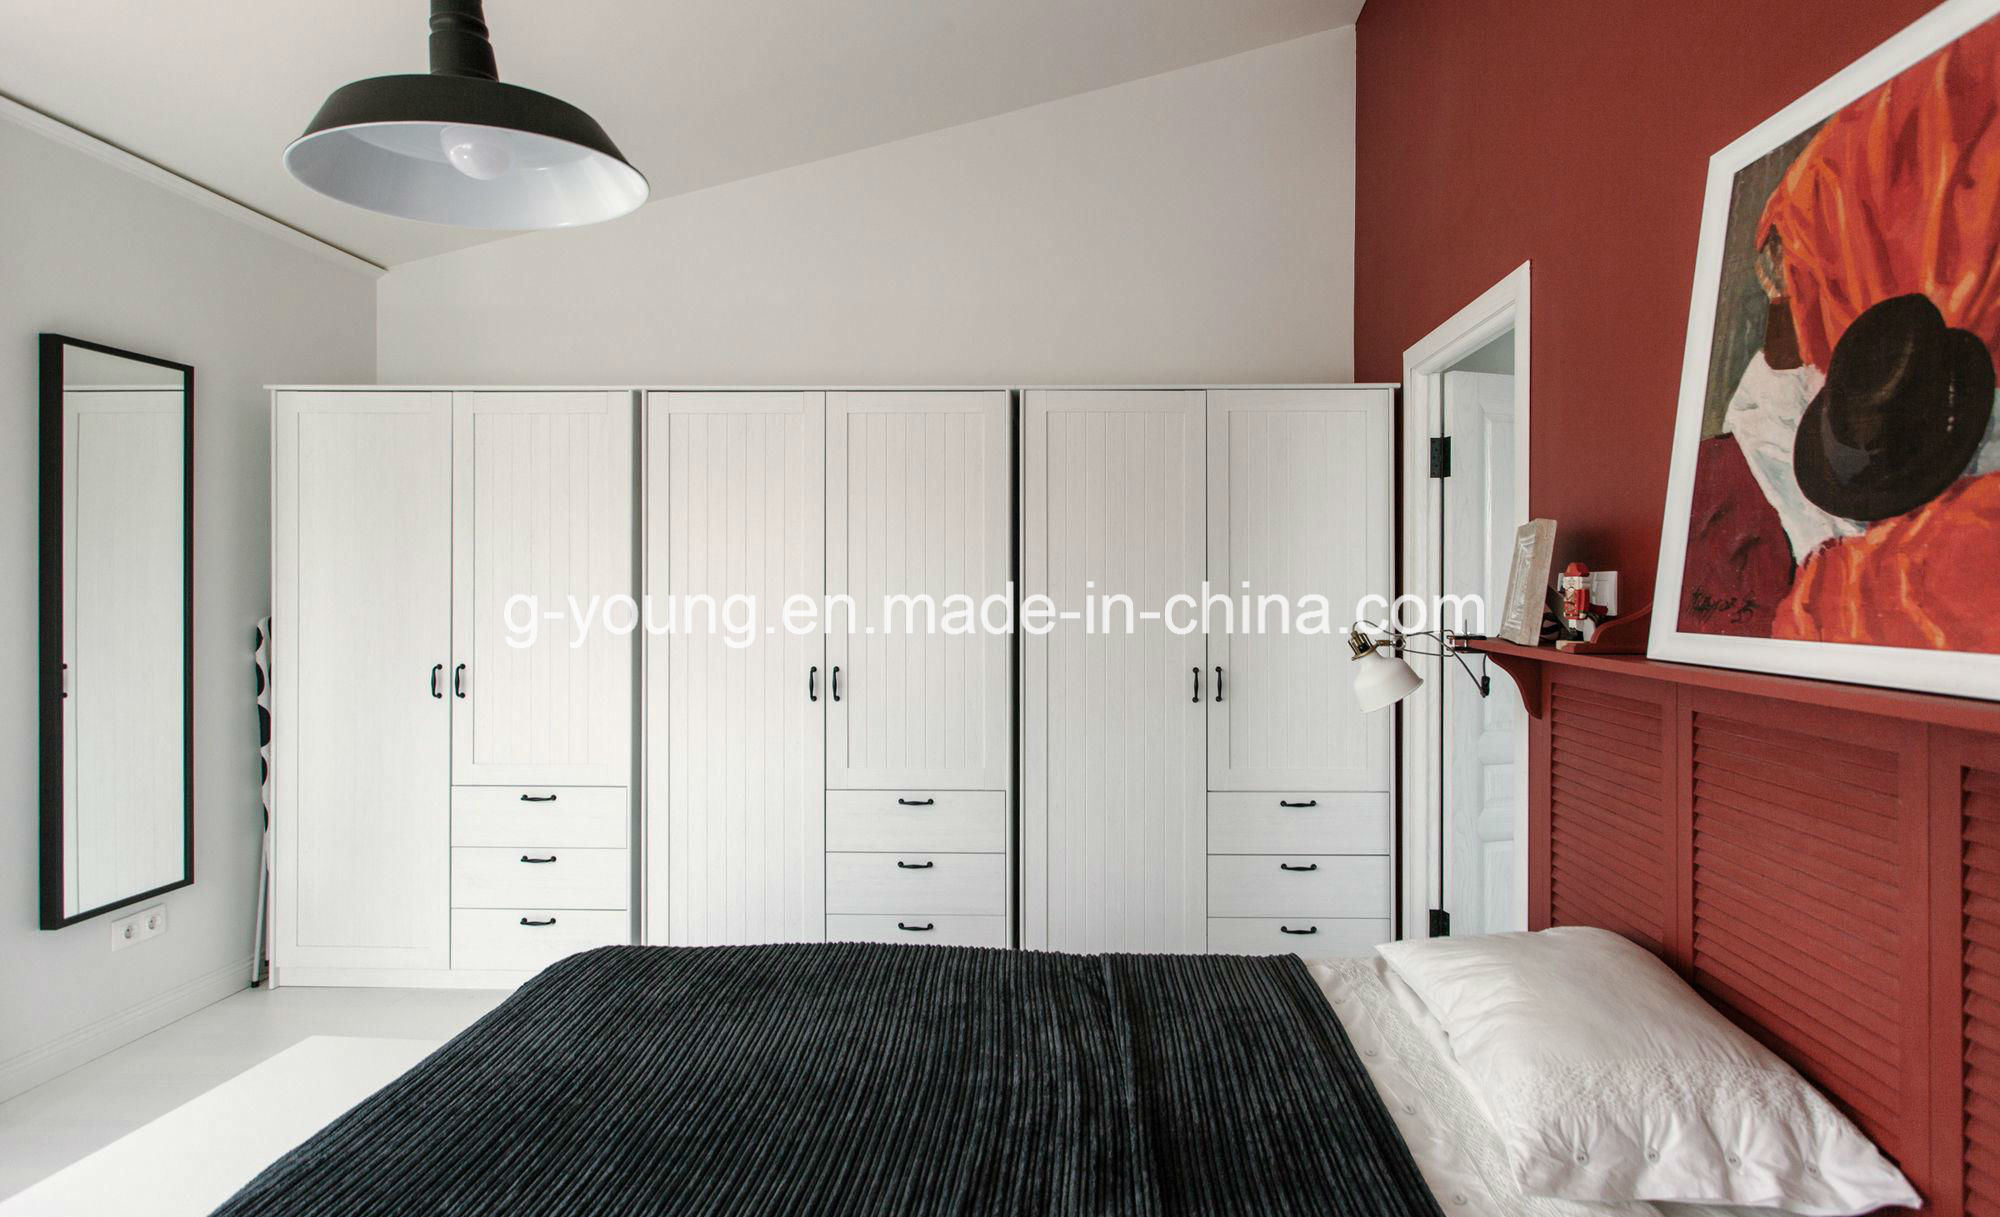 [Hot Item] Small Size Home Hotel Bedroom Furniture Wood Veneer Closet  Wardrobe